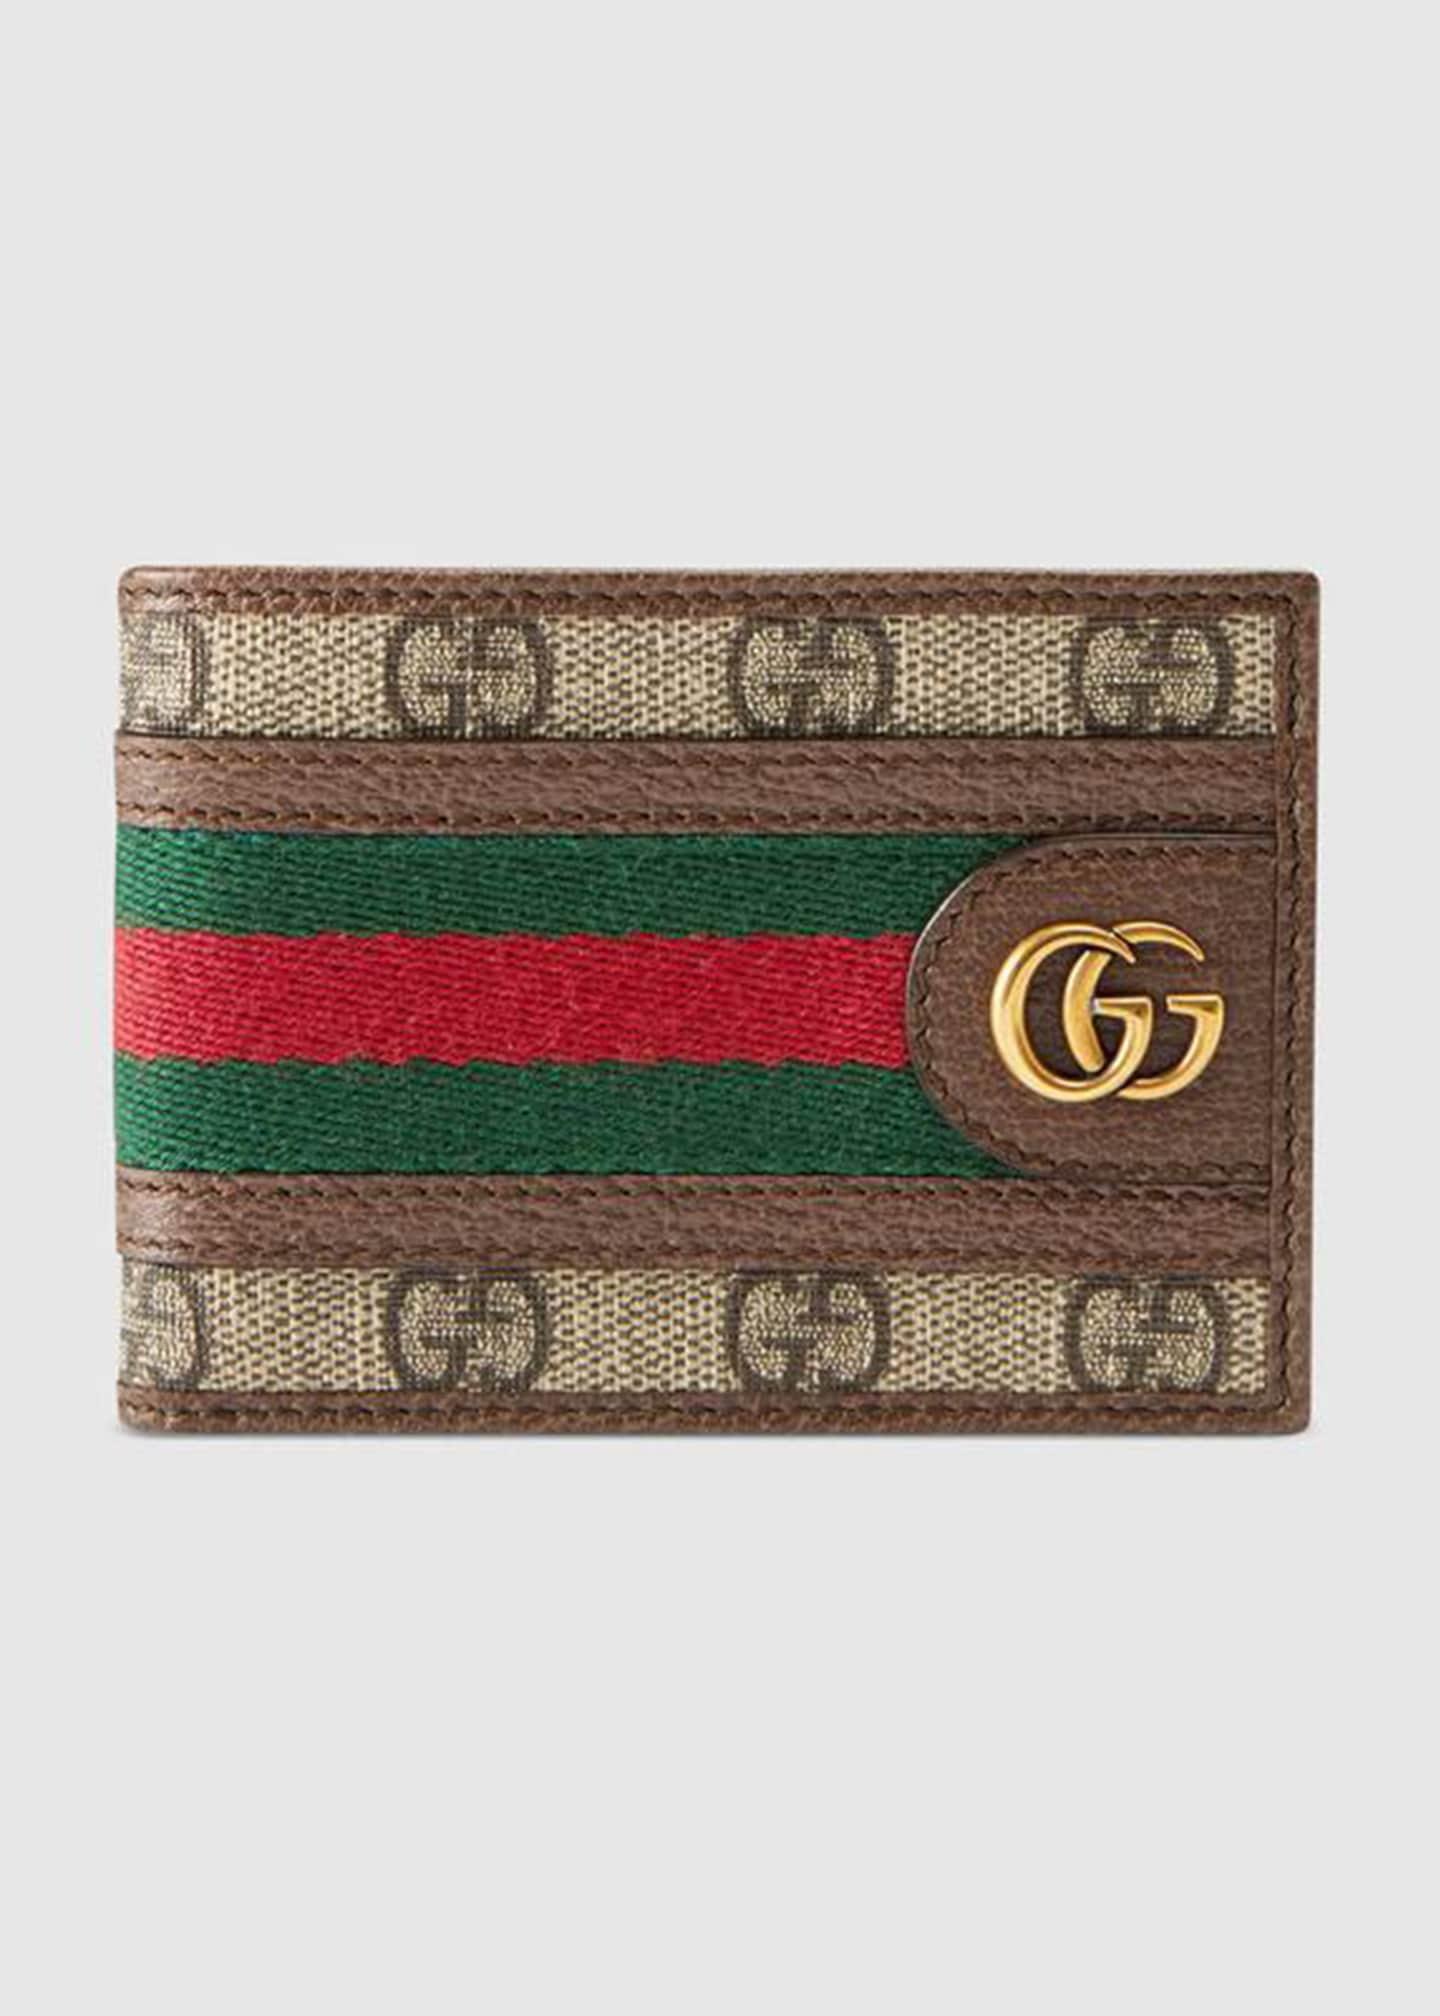 Gucci Men's GG Supreme Marmont Bifold Wallet